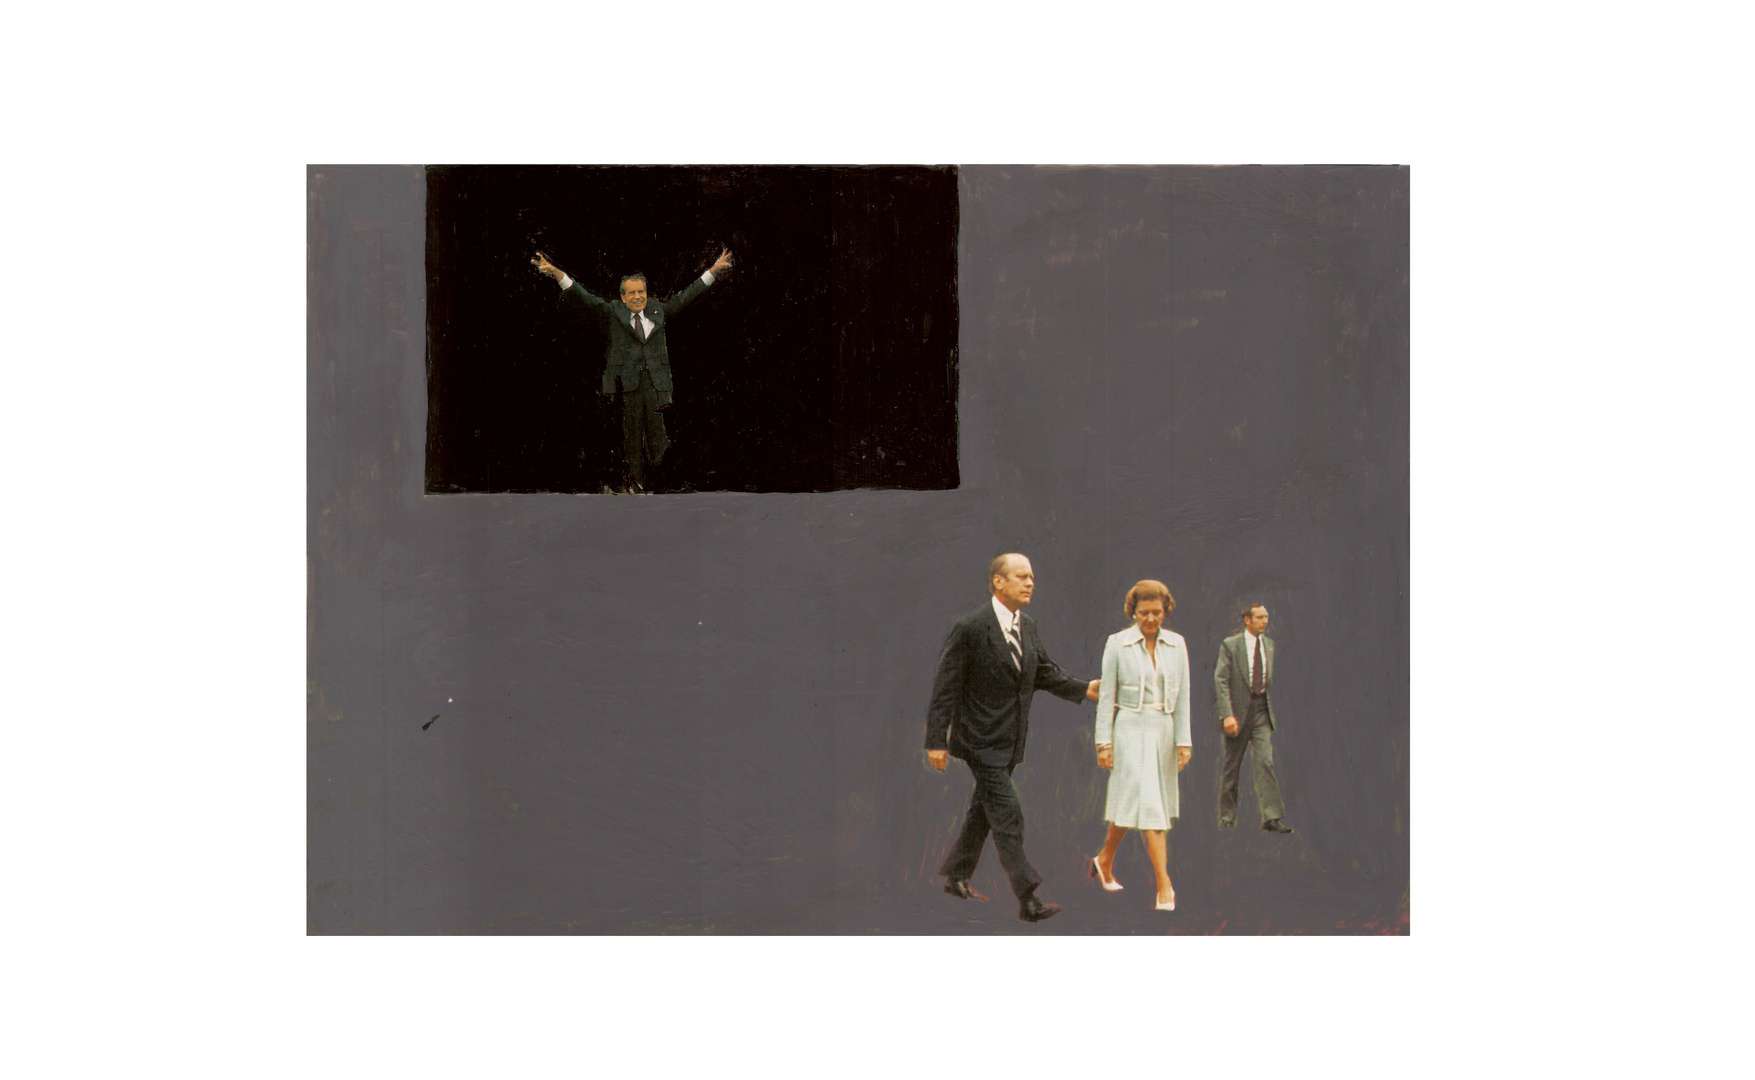 Hall_Paint_Nixon_Ford_Clean.jpg